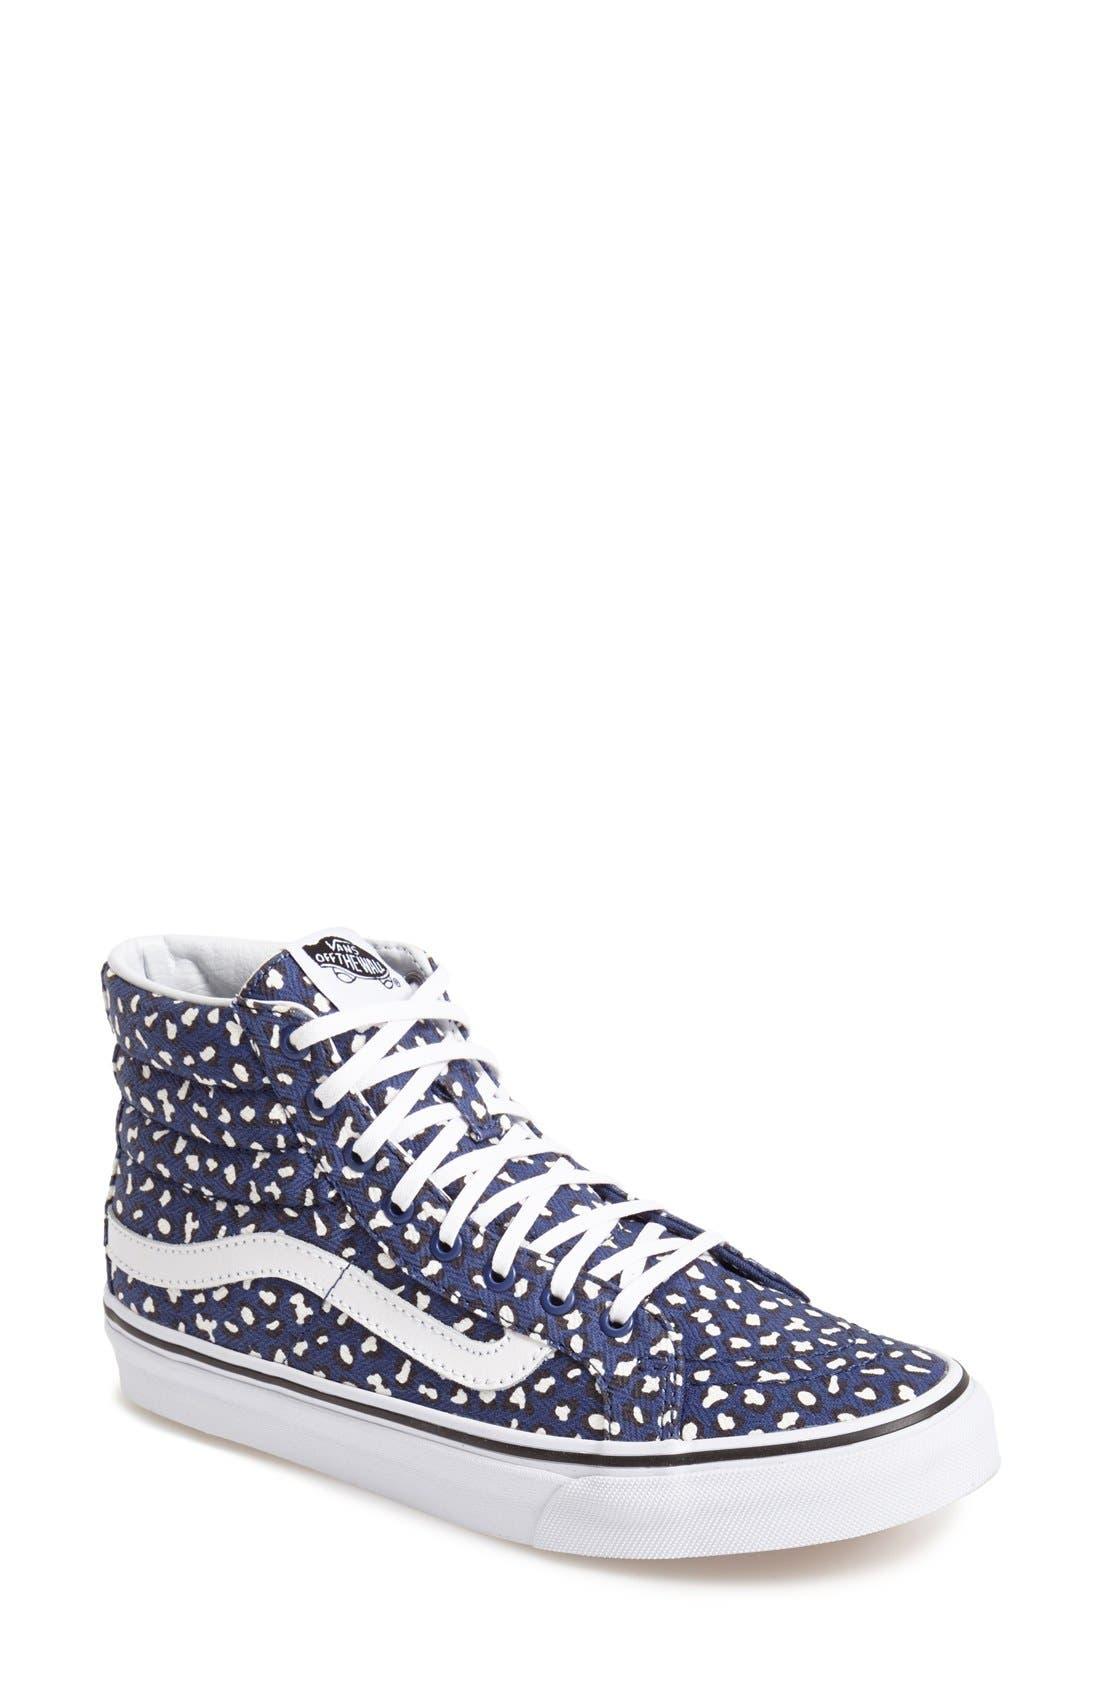 Main Image - Vans 'Herringbone Leopard - Sk8-Hi Slim' Sneaker (Women)